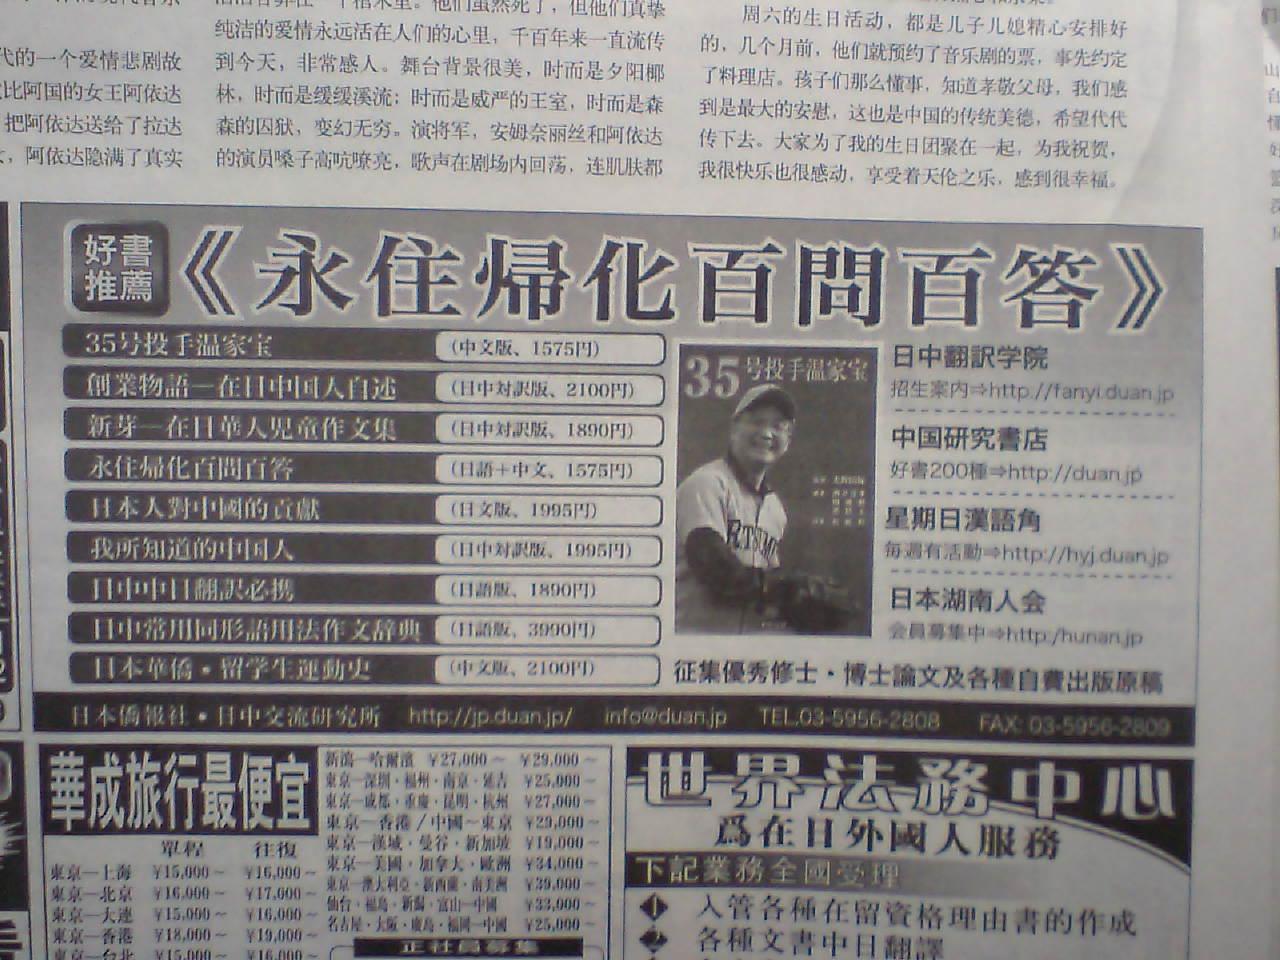 中文導報に広告出稿 『永住帰化百問百答』など良書_d0027795_2238017.jpg